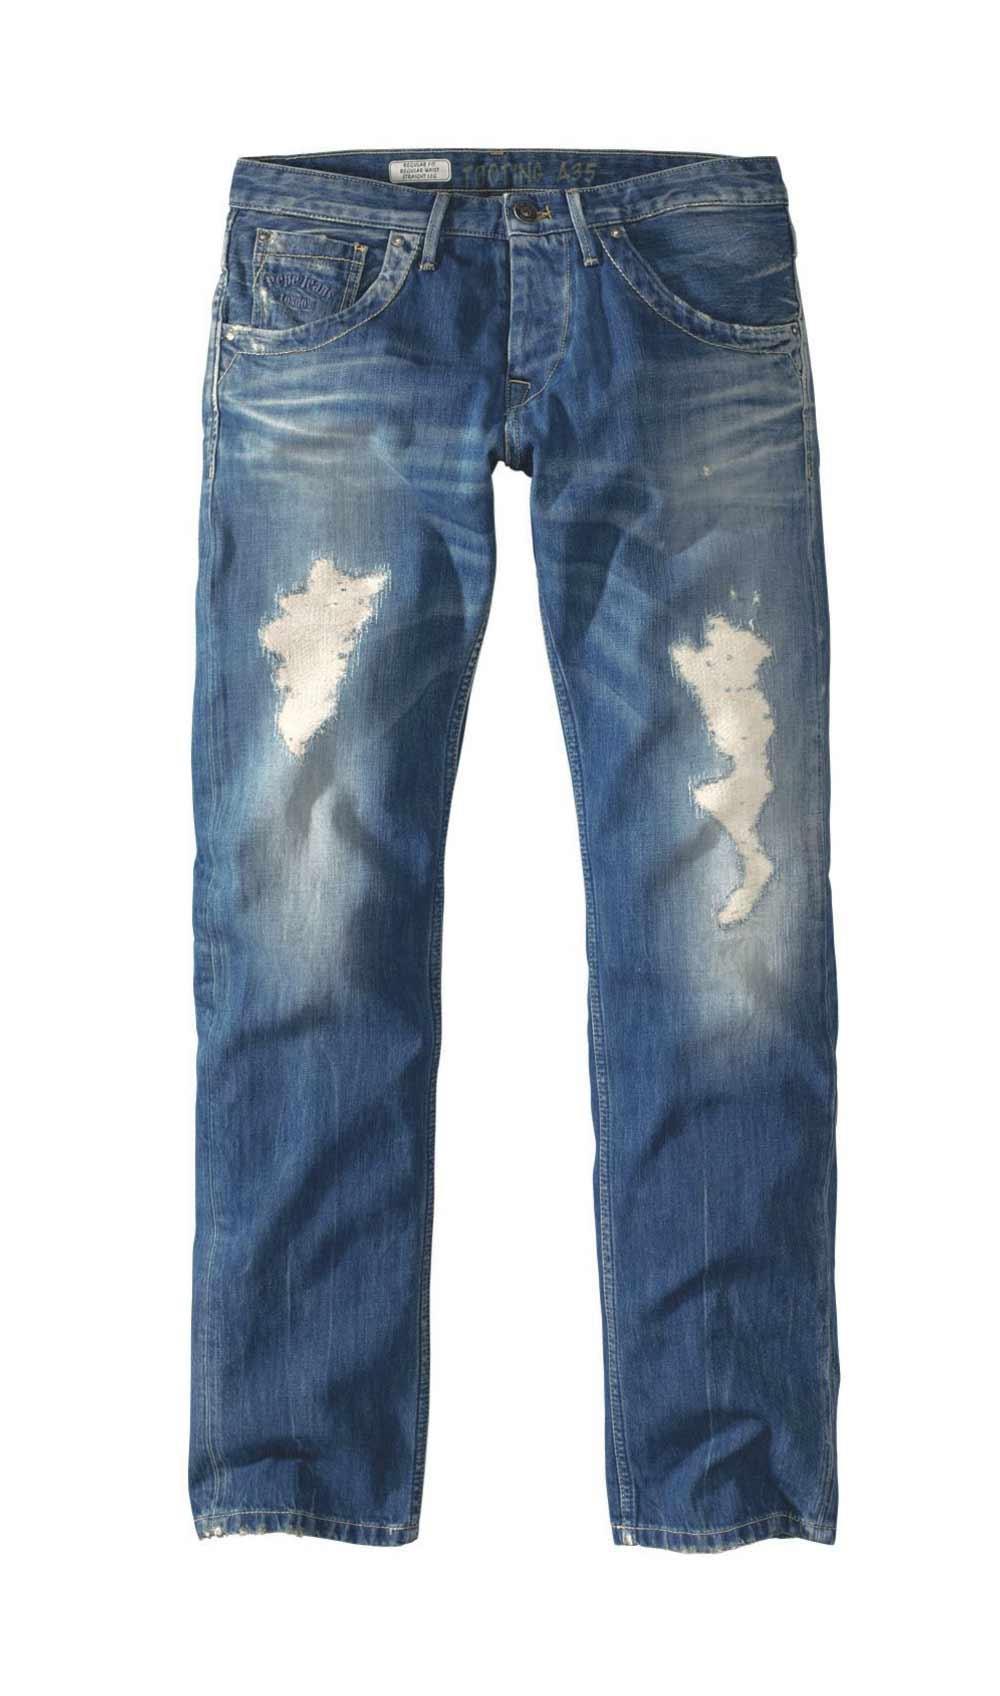 Marken-Herren-Jeans blau   Herren- Kinder-Mode   Outlet Mode-Shop de8601d868